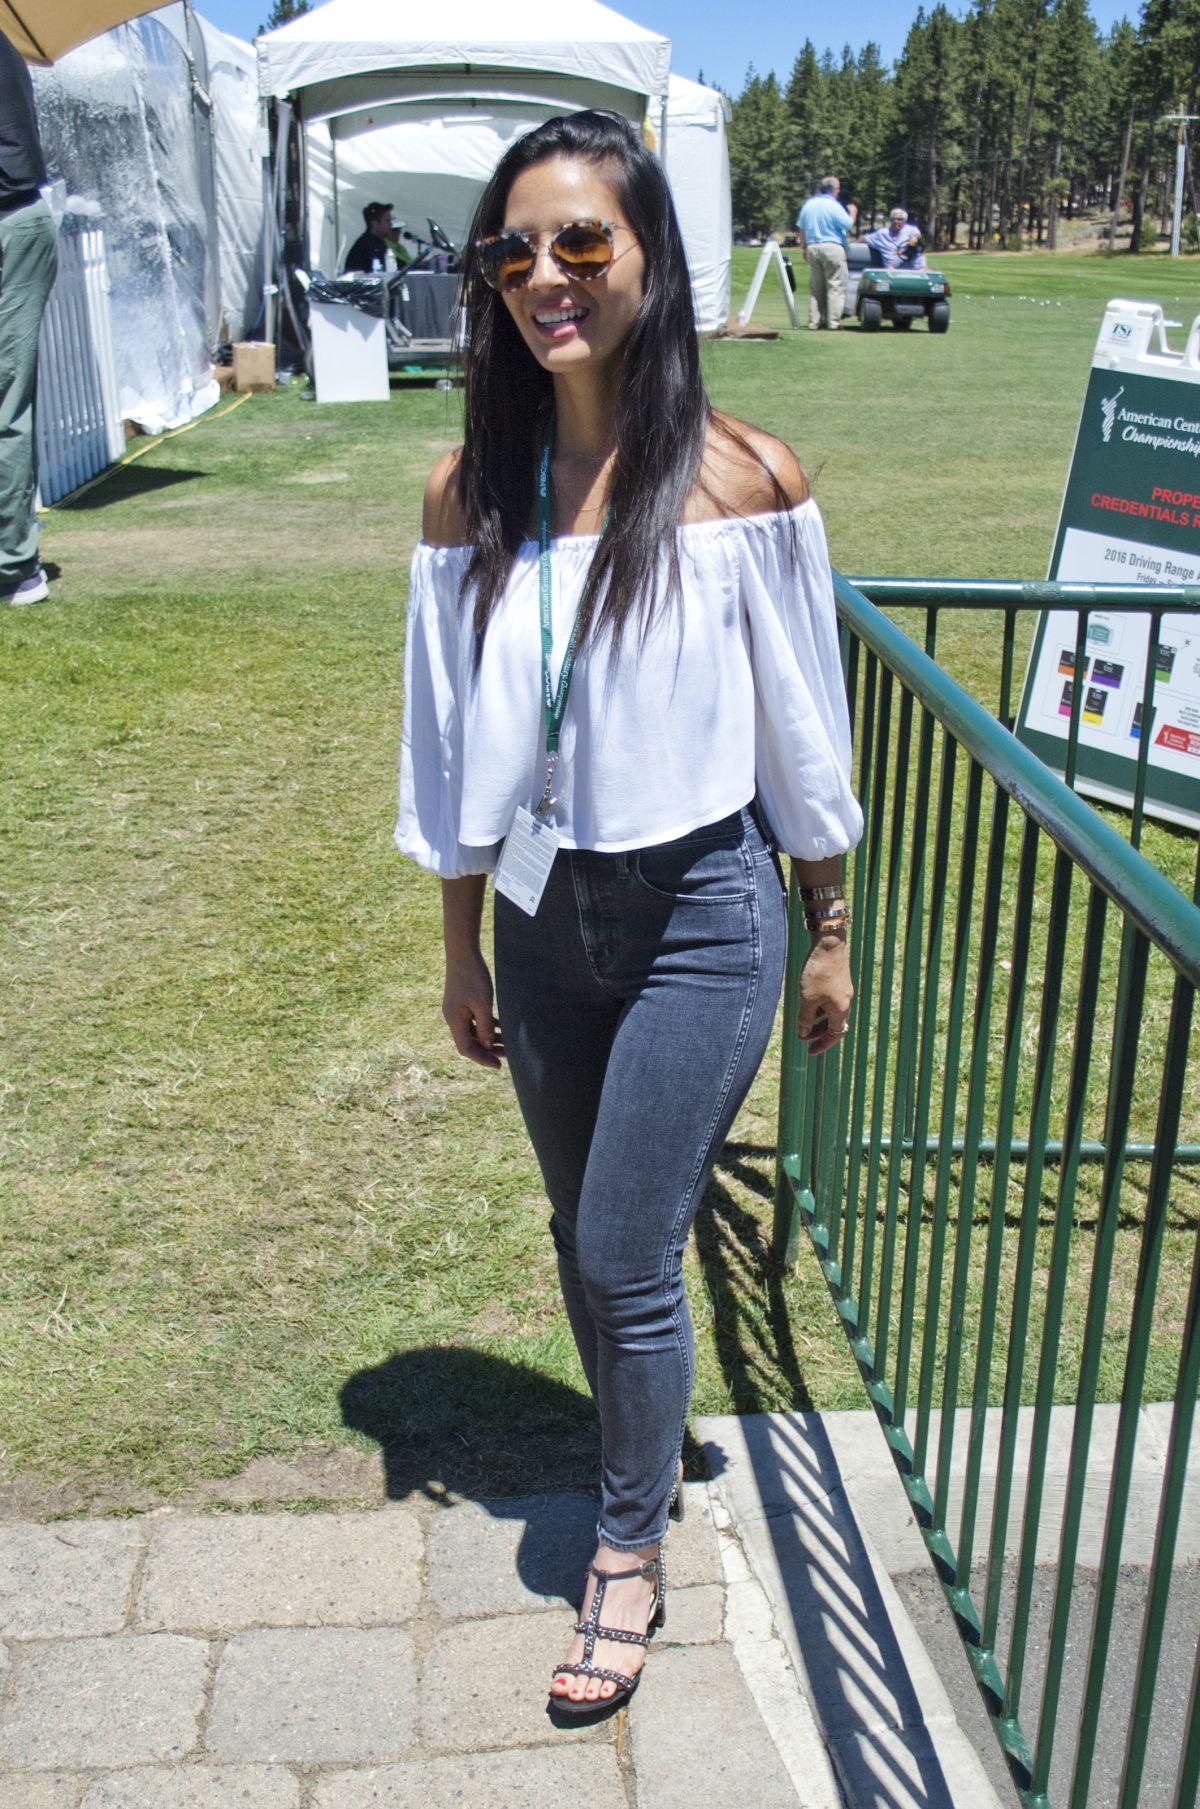 OLIVIA MUNN at Celebrity Golf Tournament 07/22/2016